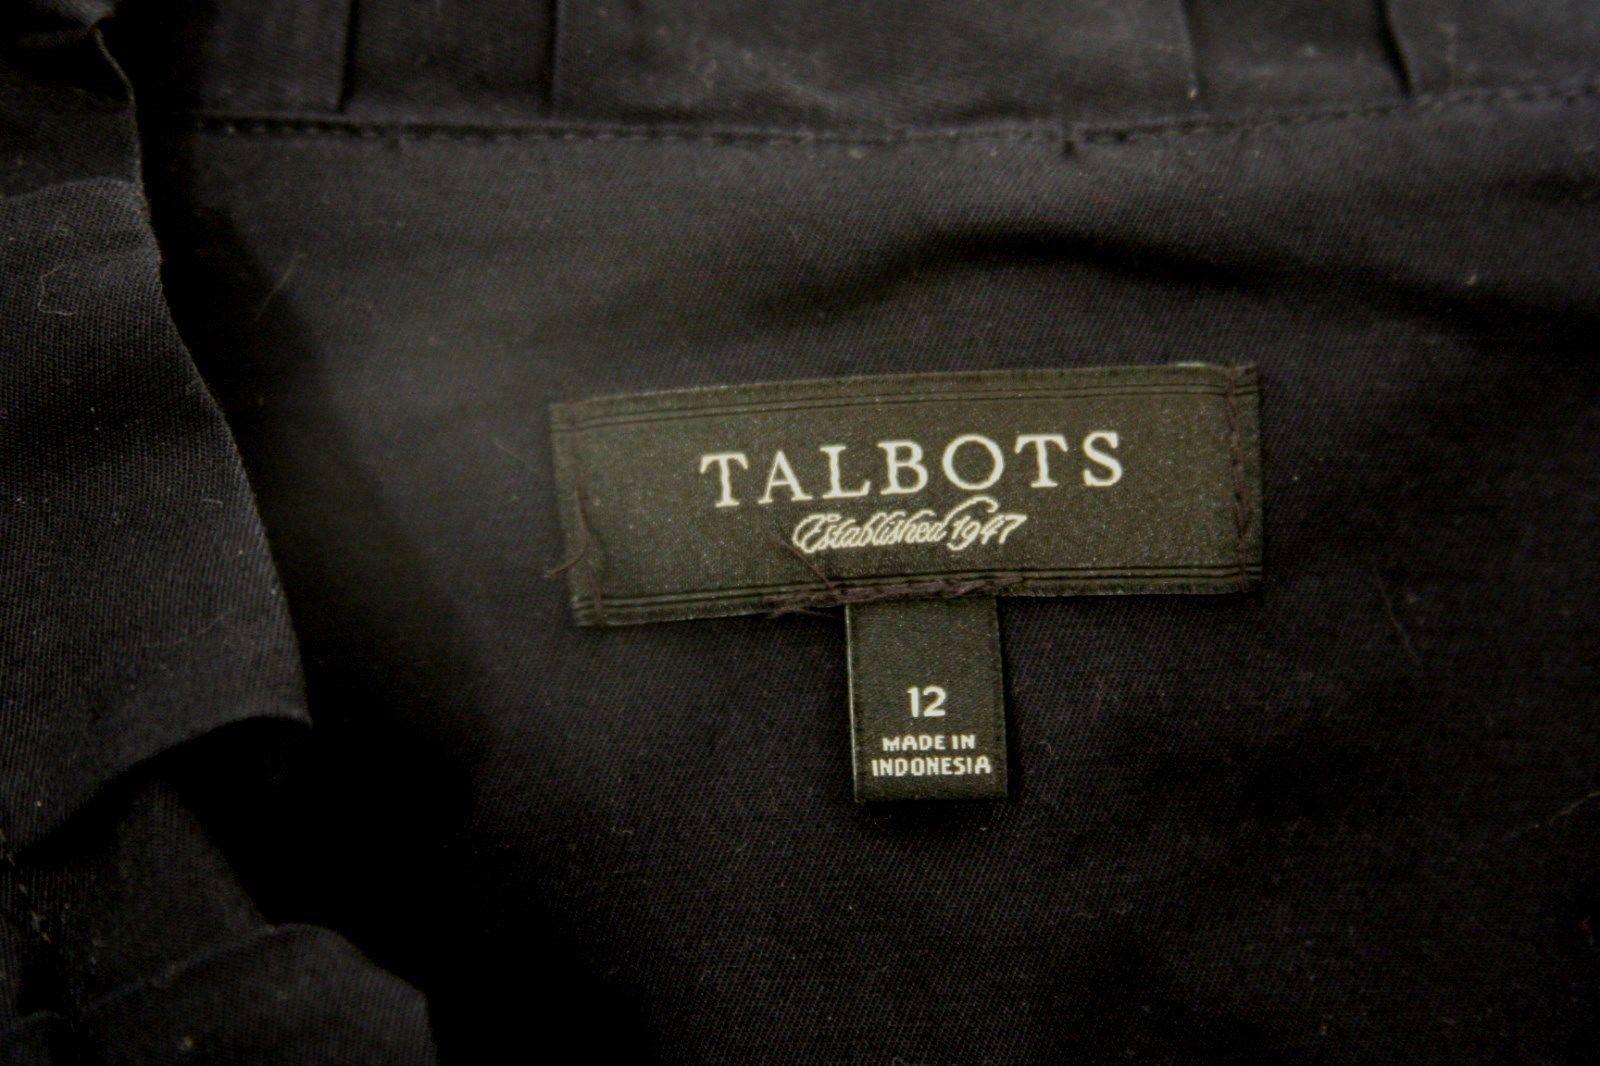 Talbots Ruffle Cotton Tailored Blazer Womens 12 Classic Grace Fit Navy Blue  image 2